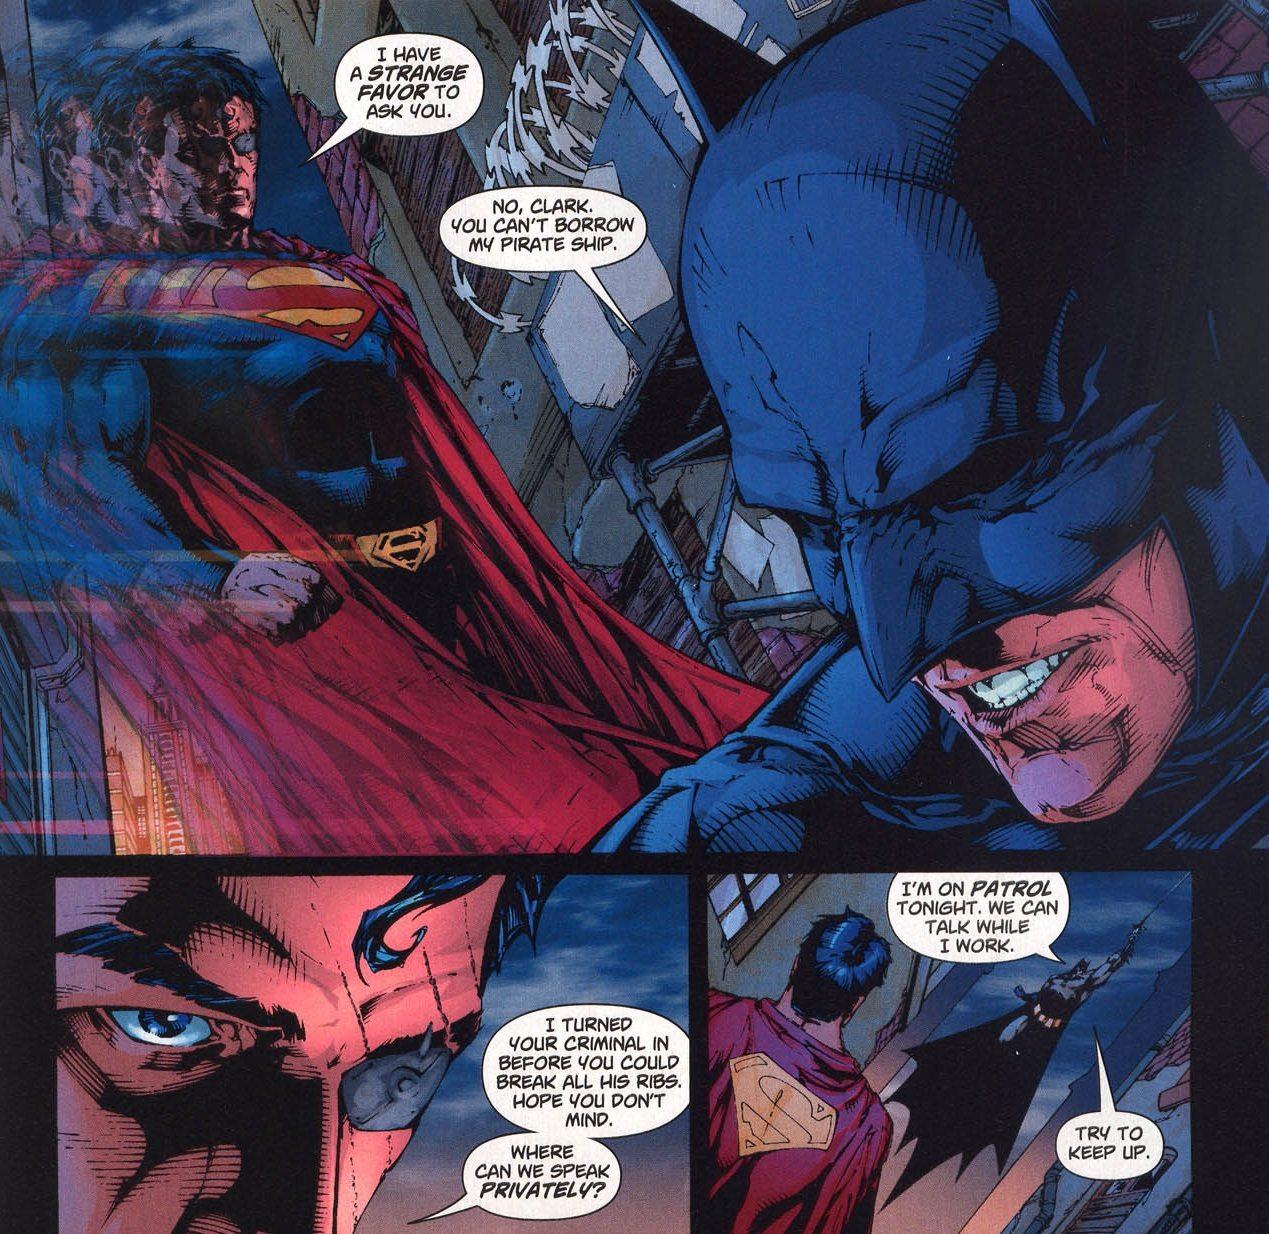 Batman gets the best lines in Superman / Batman  Image: DC Comics